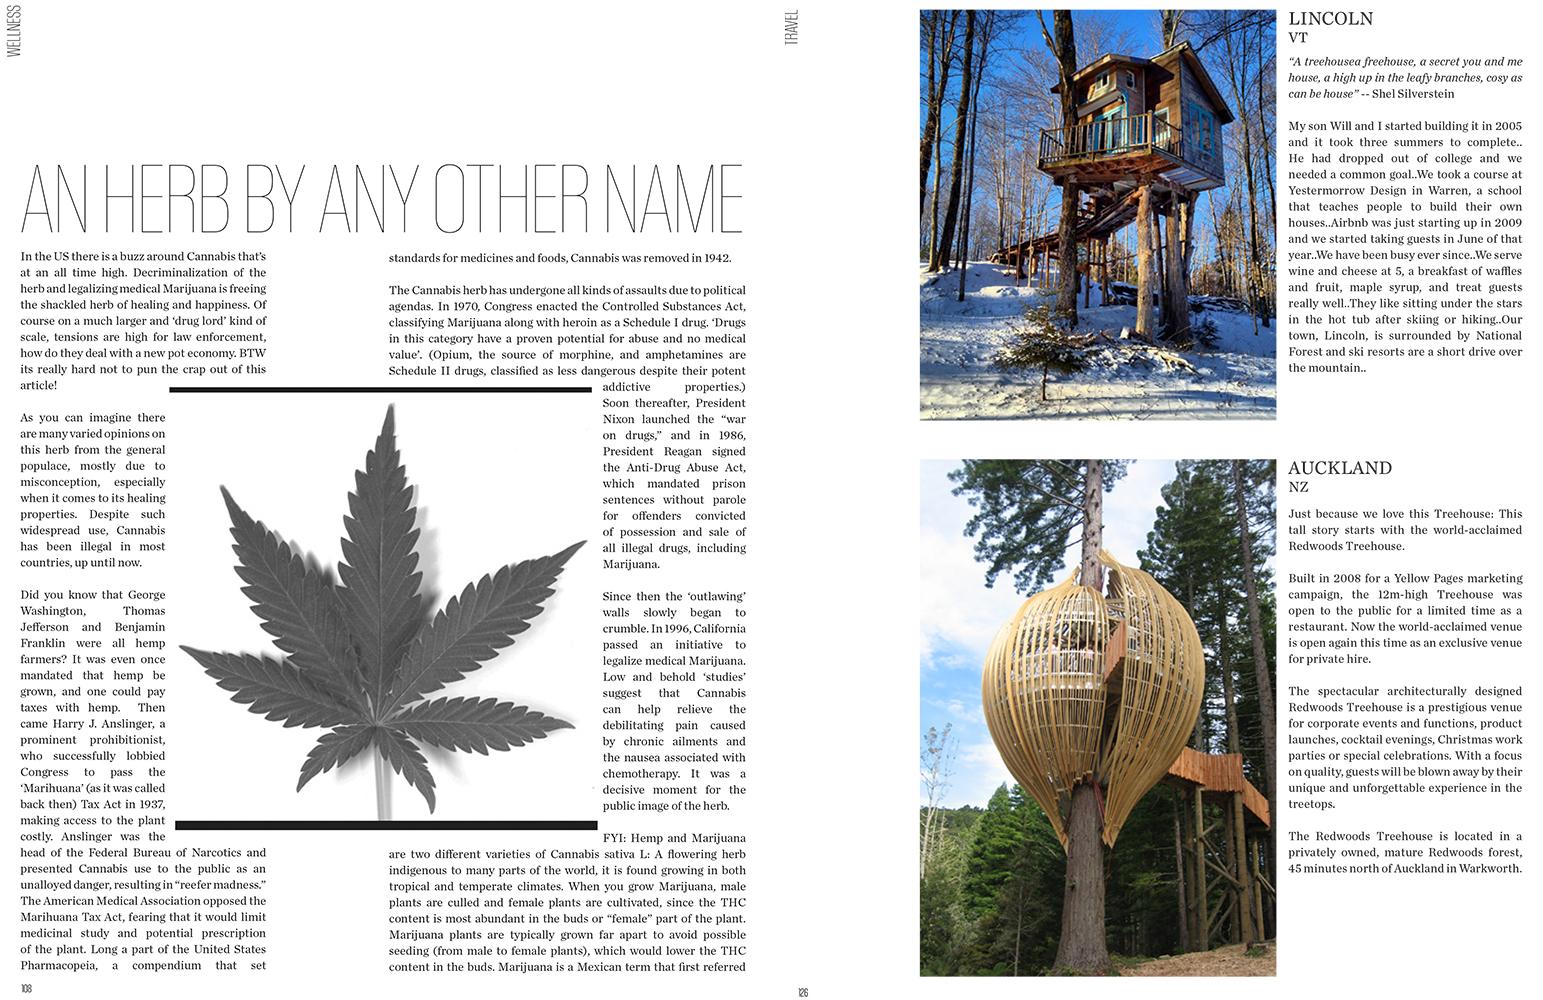 Issue No. 4-127.jpg